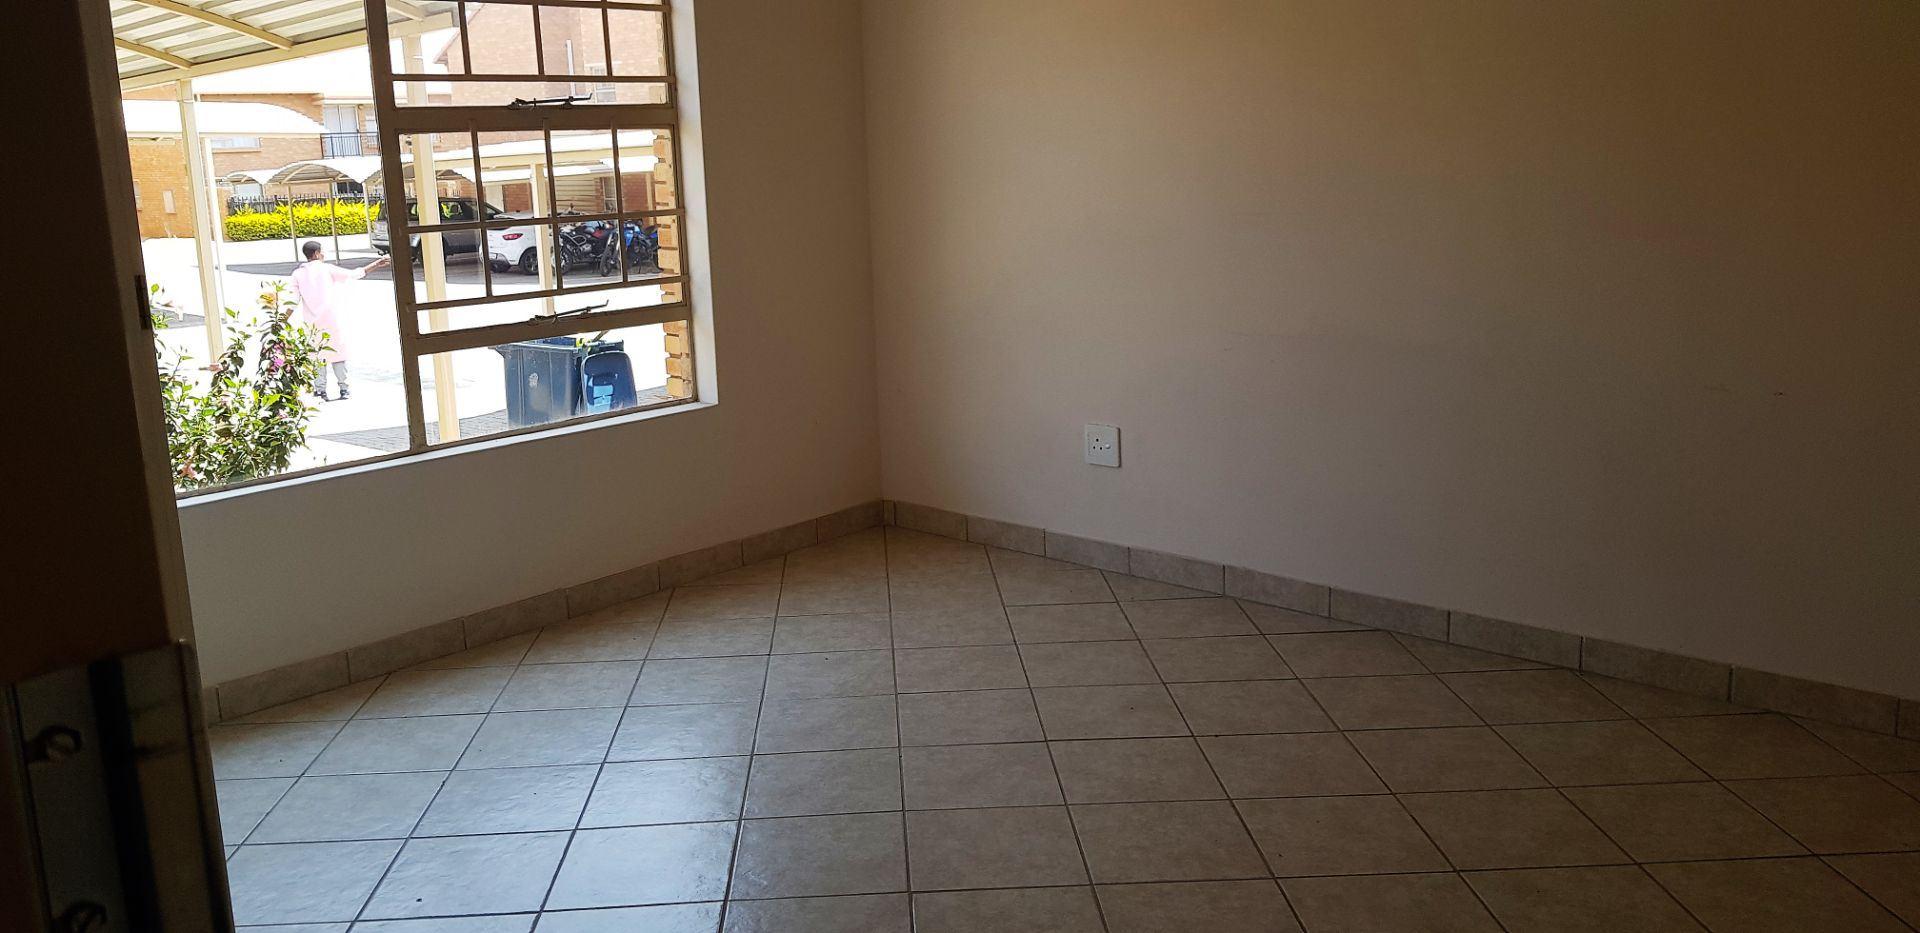 Apartment Rental Monthly in ELARDUSPARK